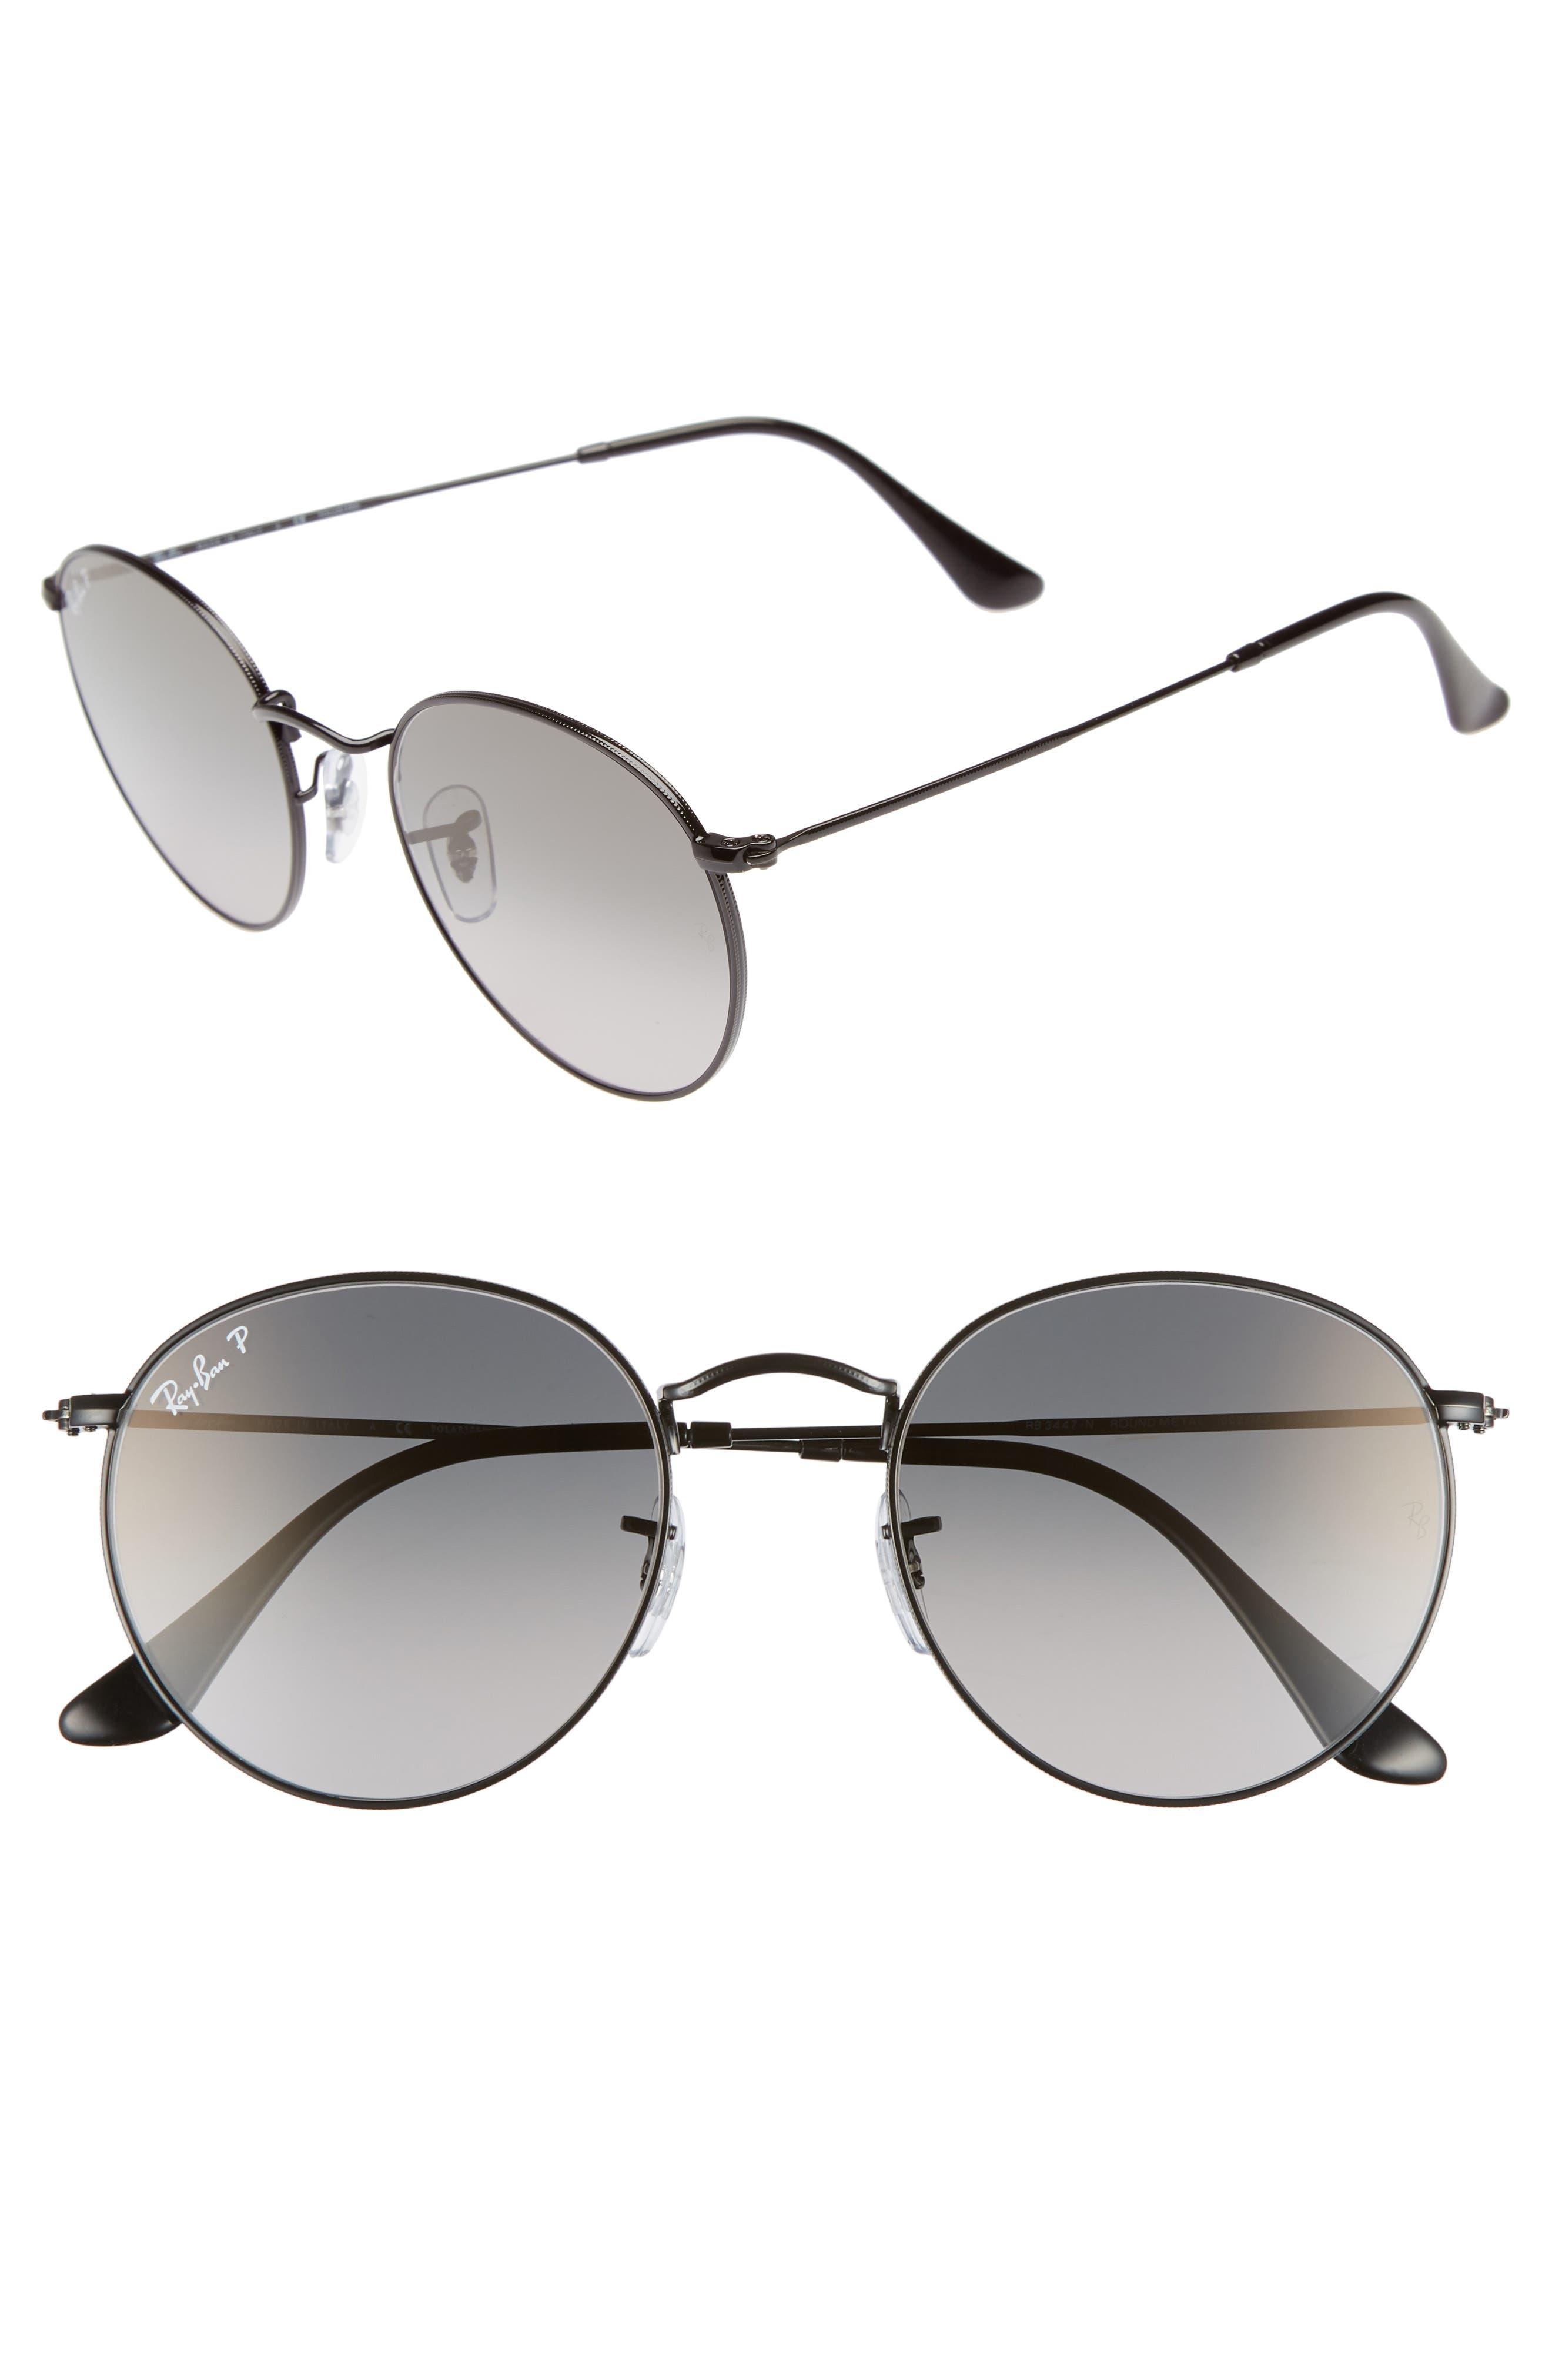 53mm Polarized Round Sunglasses,                             Main thumbnail 1, color,                             BLACK GRADIENT